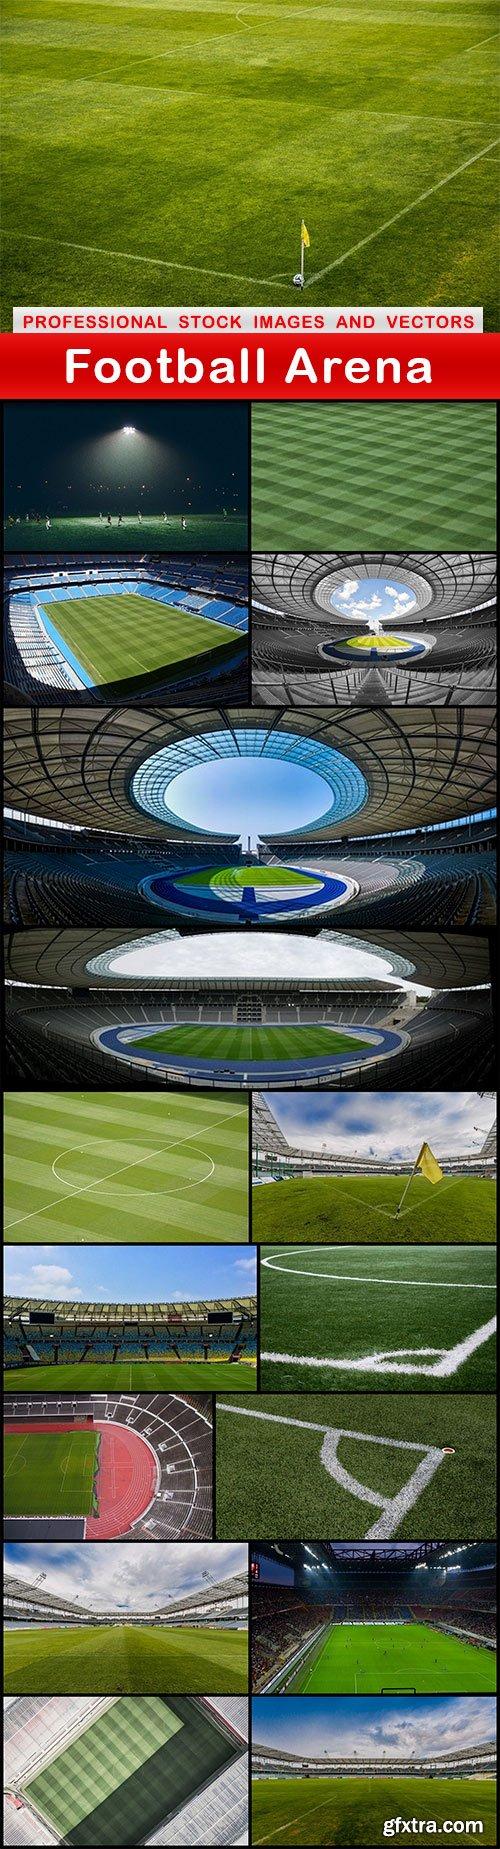 Football Arena - 17 UHQ JPEG